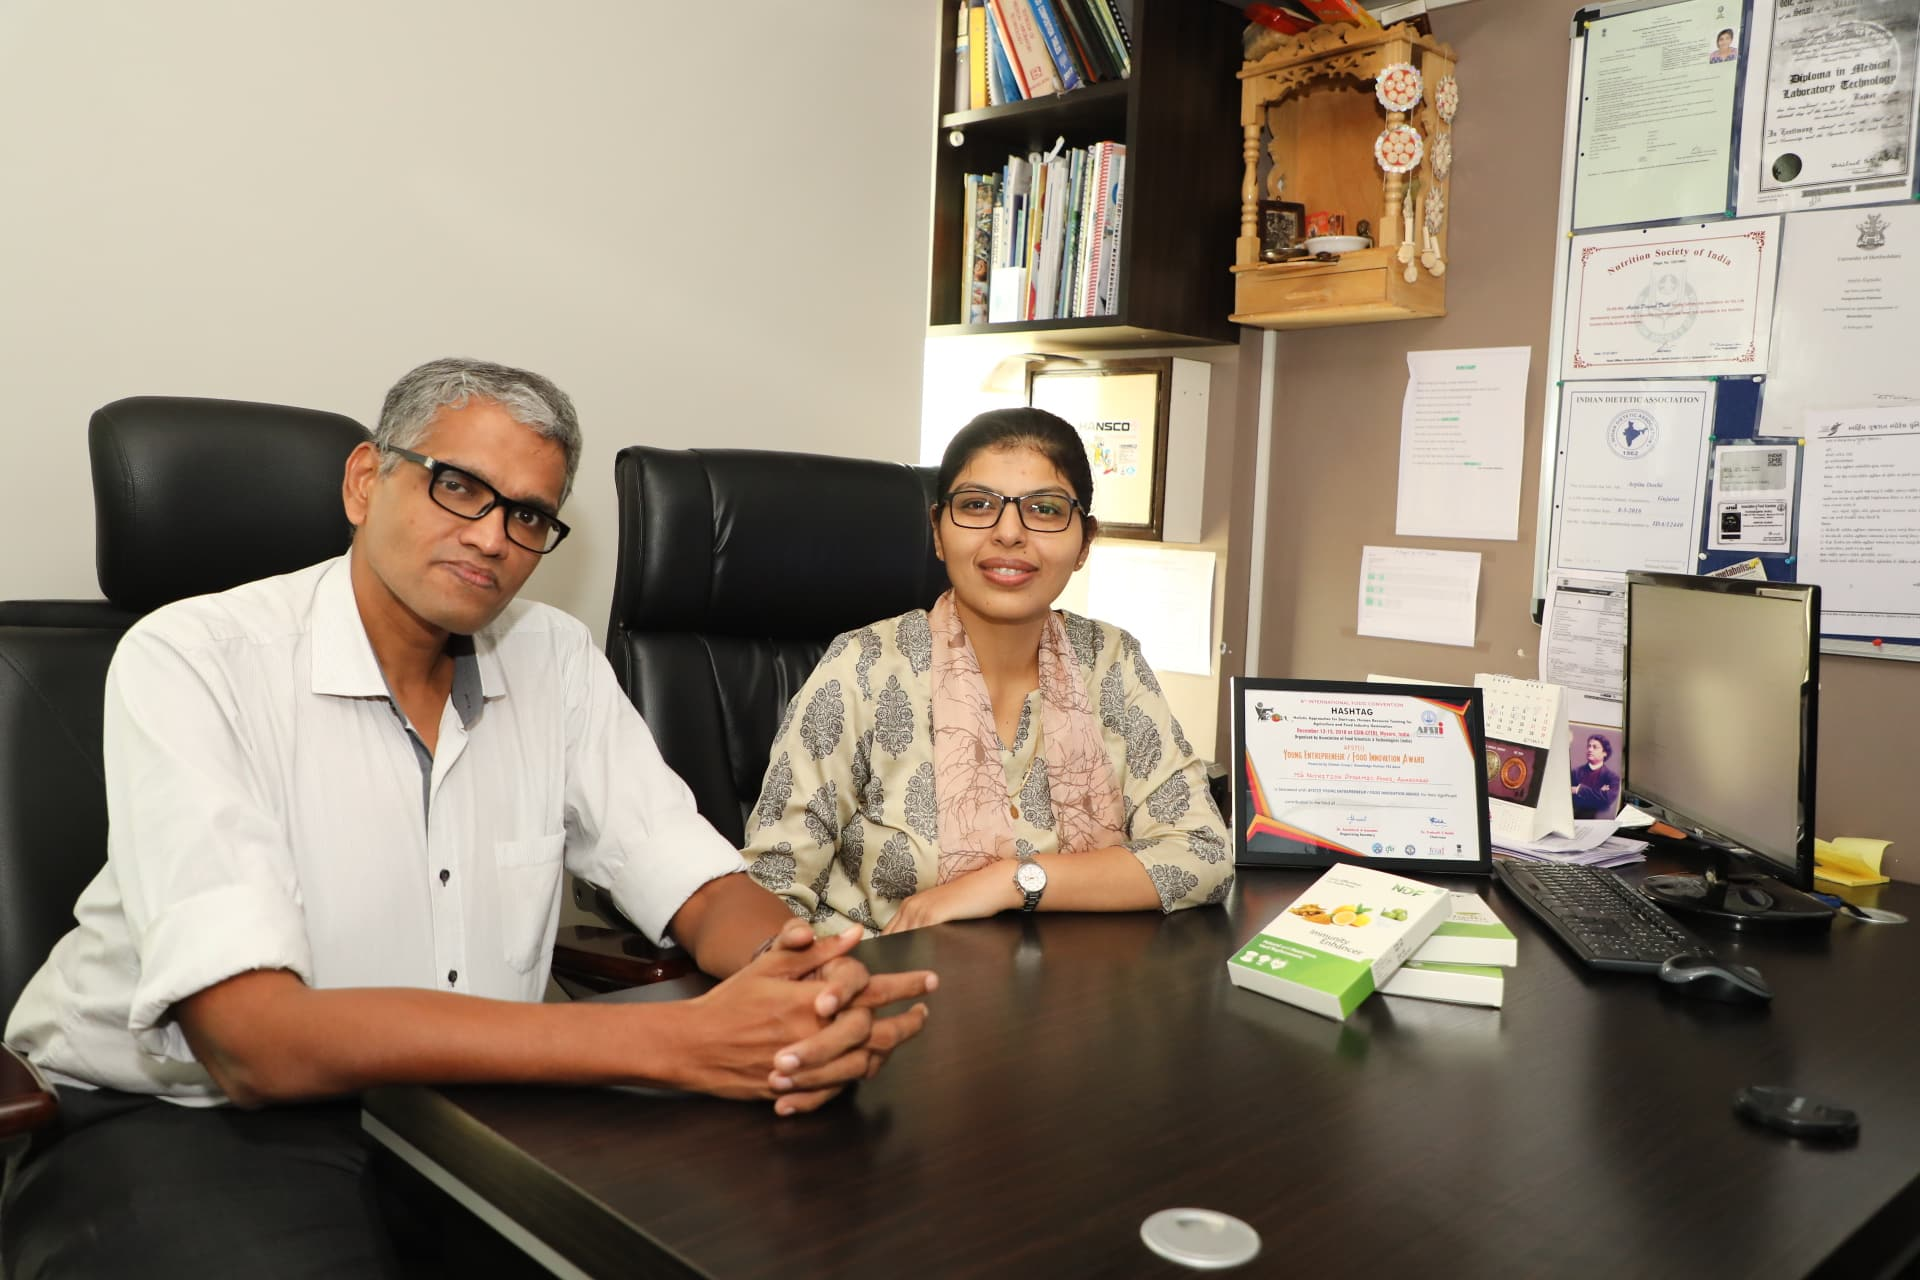 Arpita Divyesh Doshi Has Invented Food That' Makes You Healthy